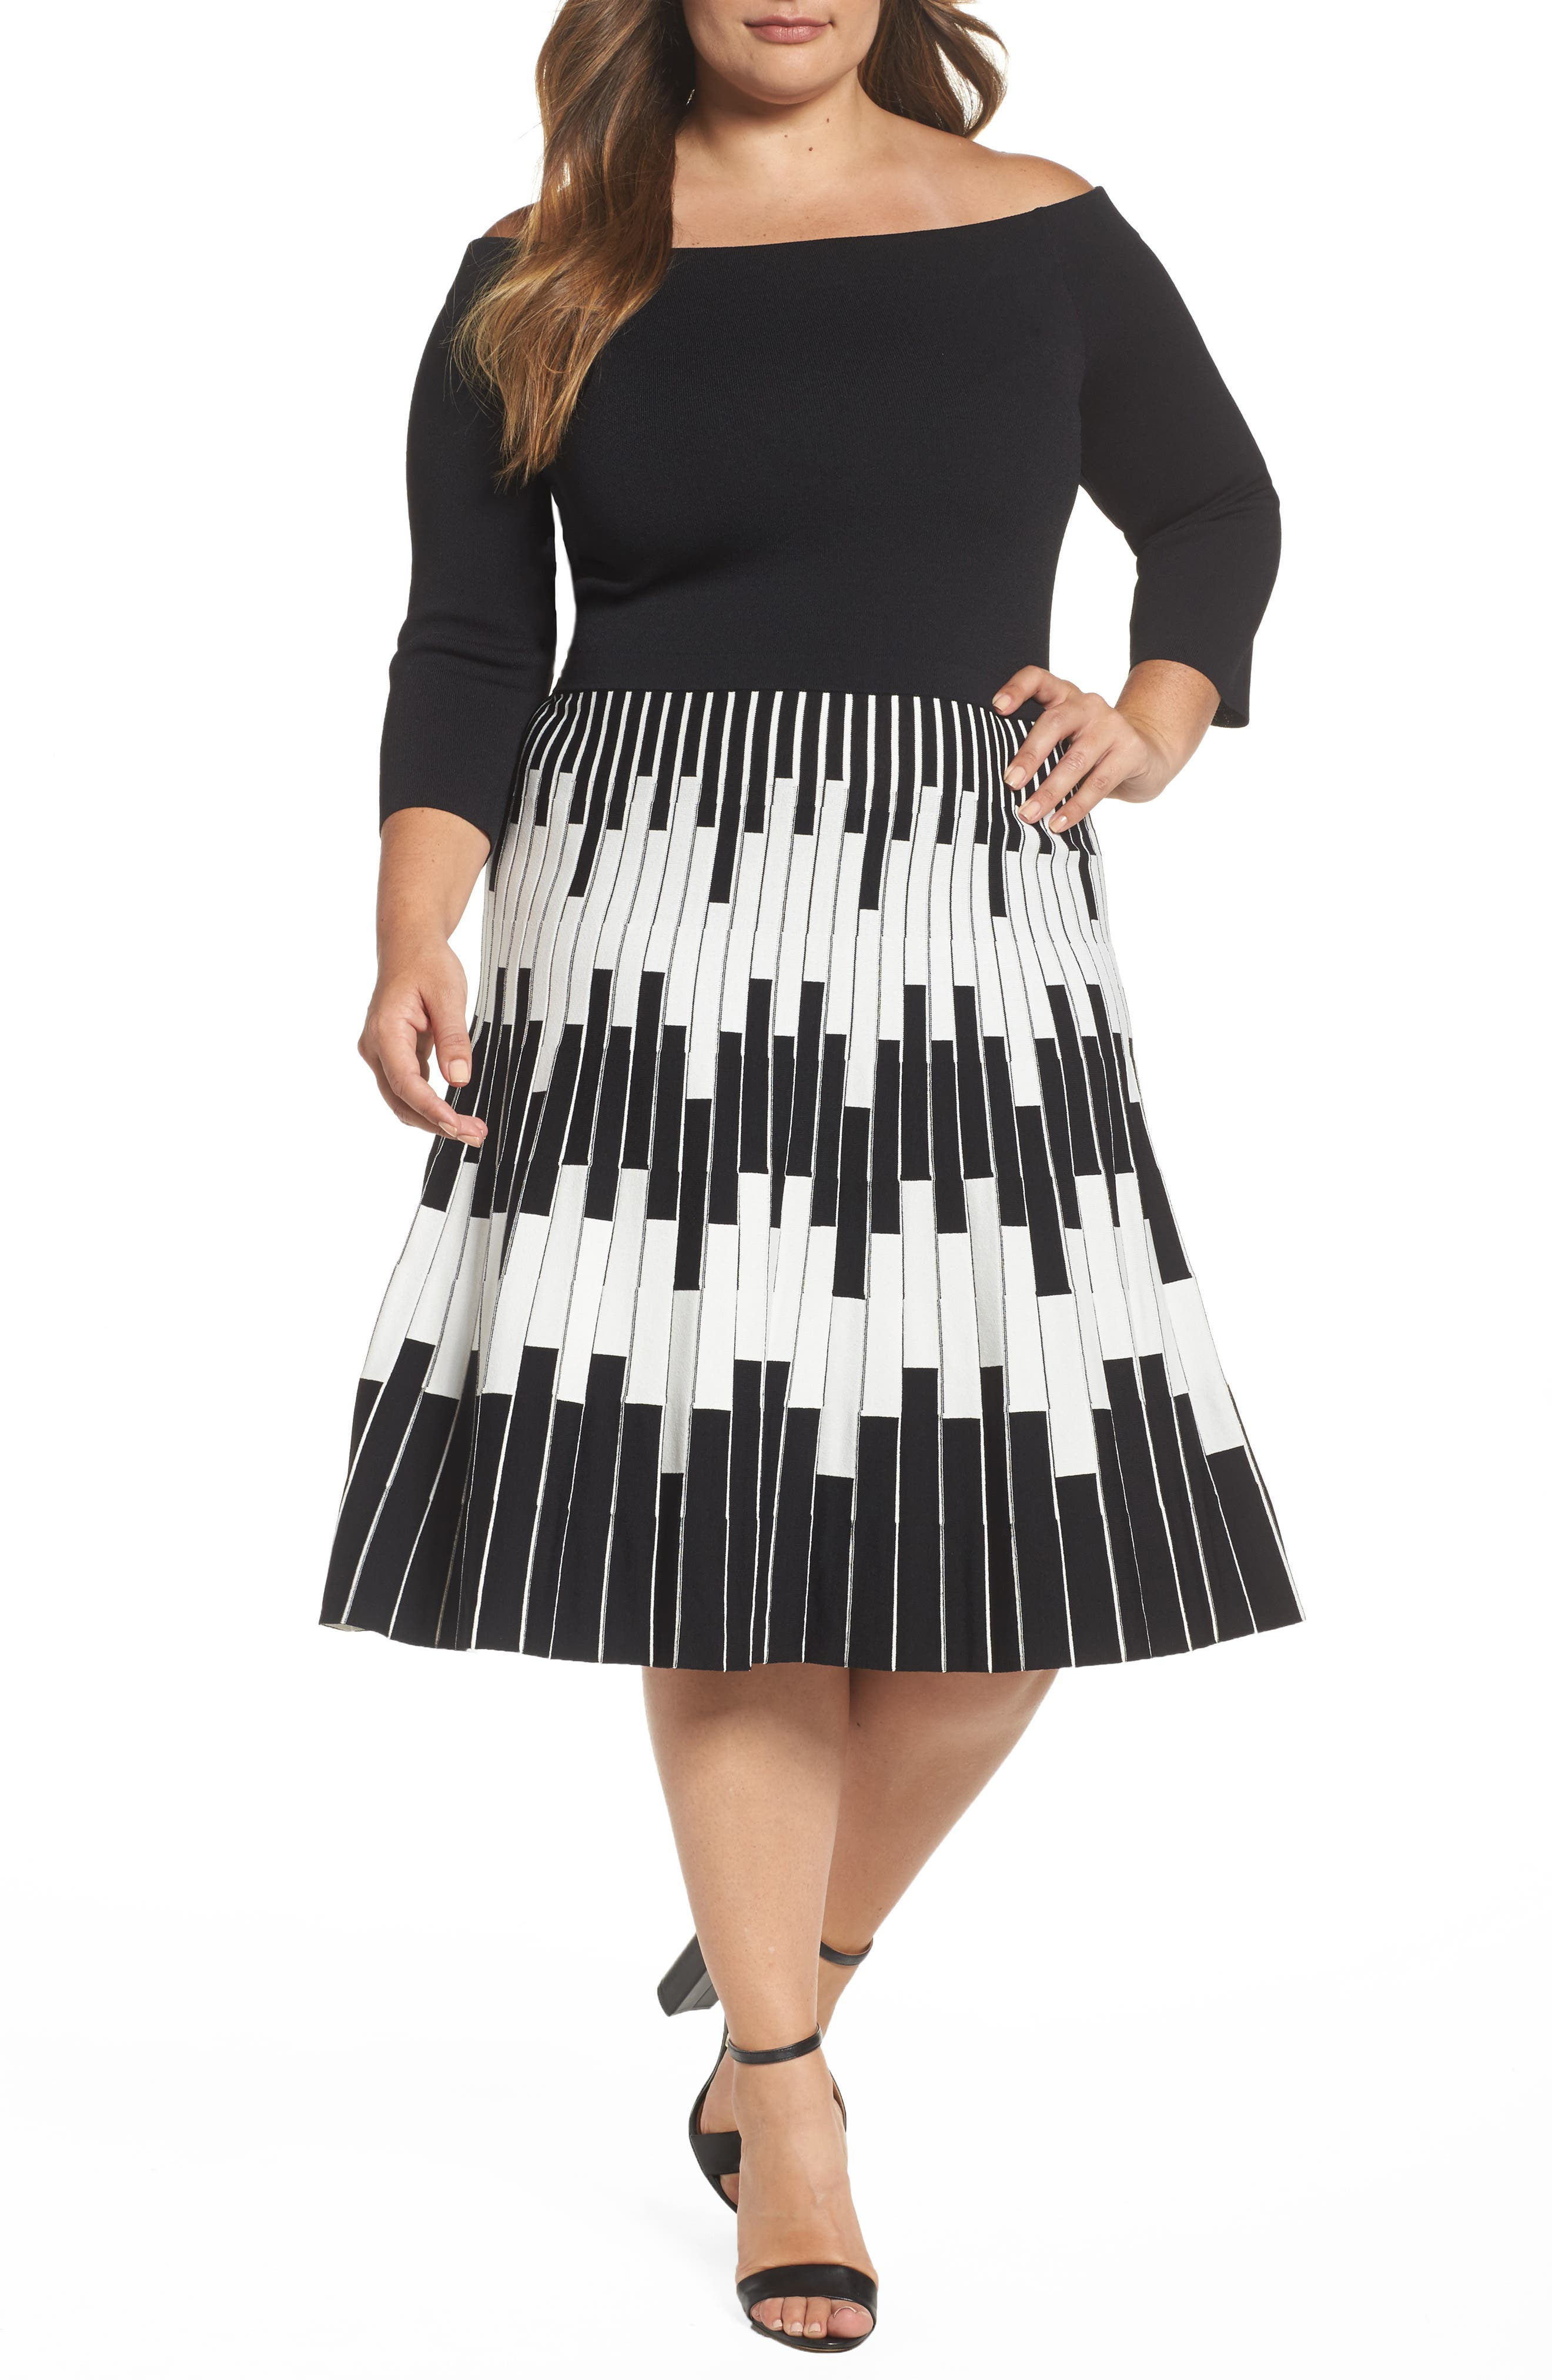 Alternate Image 1 Selected - Eliza J Knit Fit & Flare Dress (Plus Size)